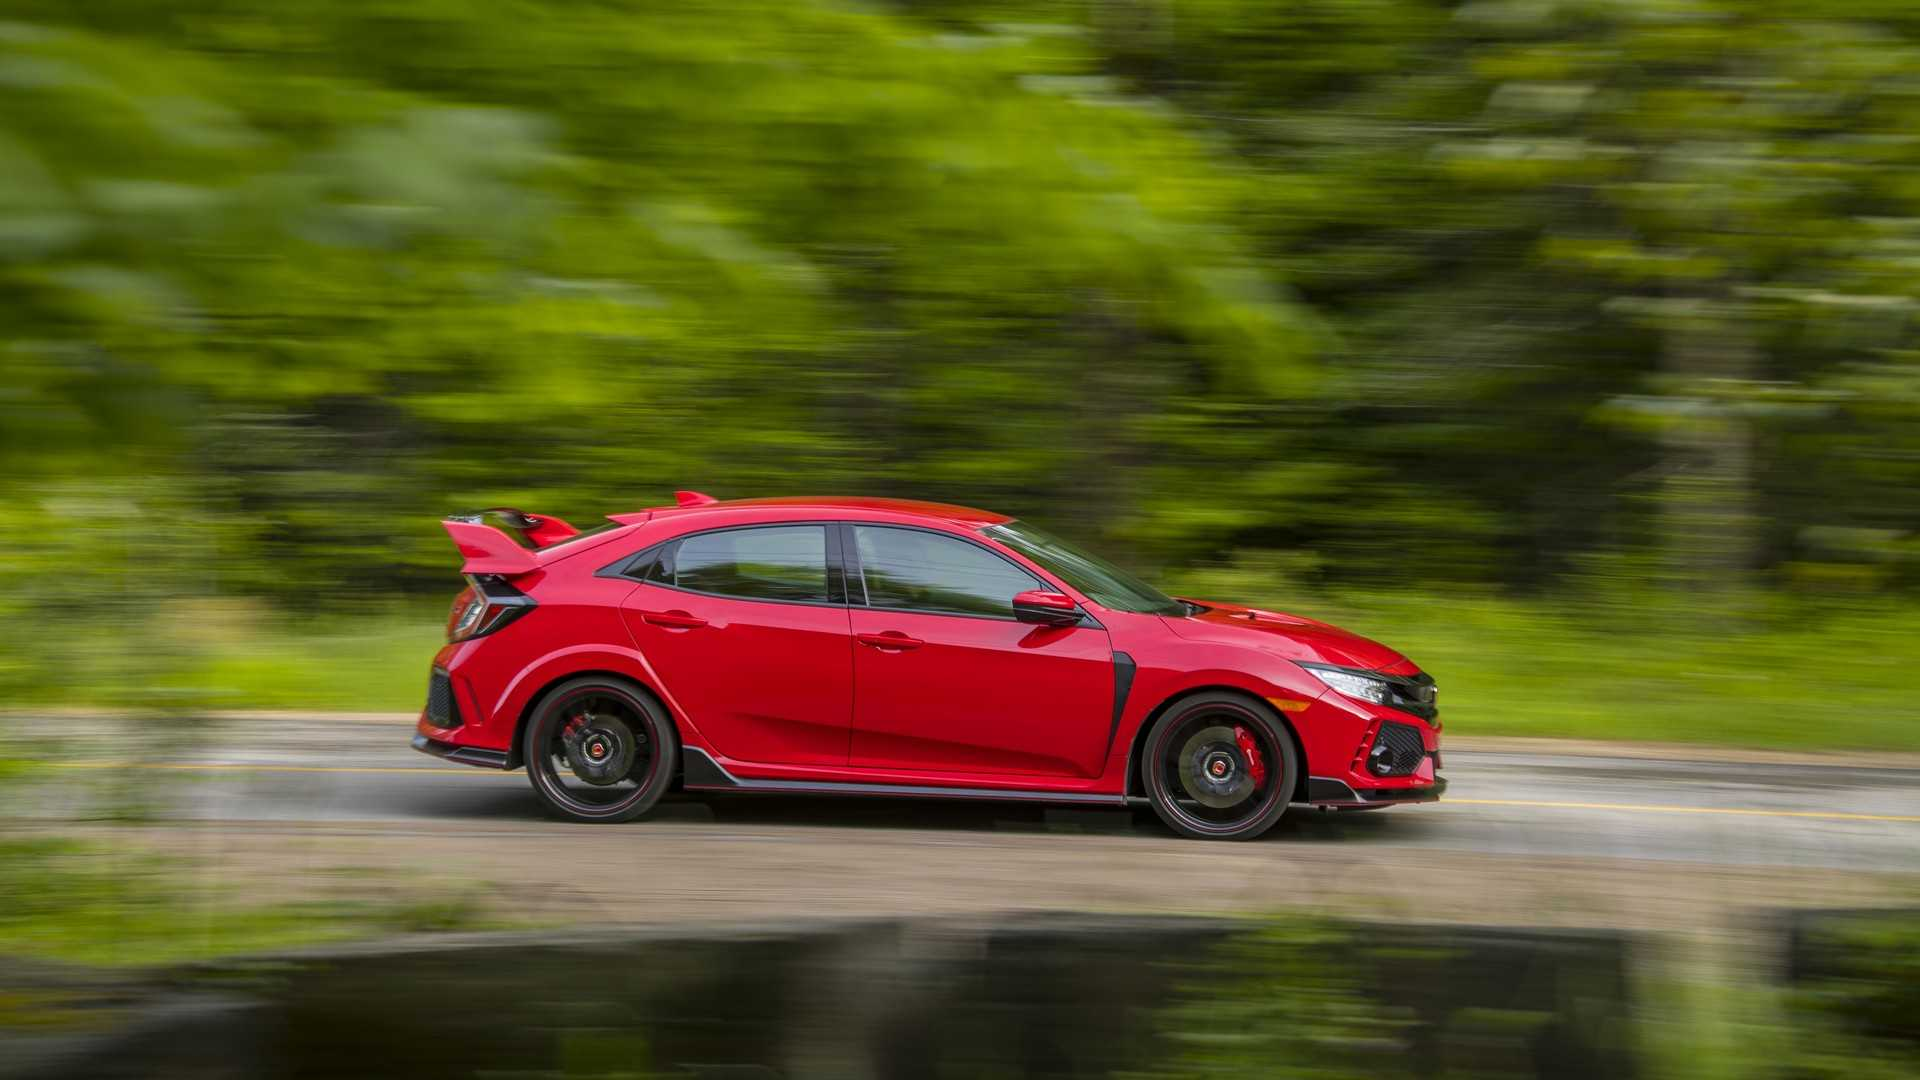 2019 Honda Civic Type R (Color: Rallye Red) Side Wallpaper (6)